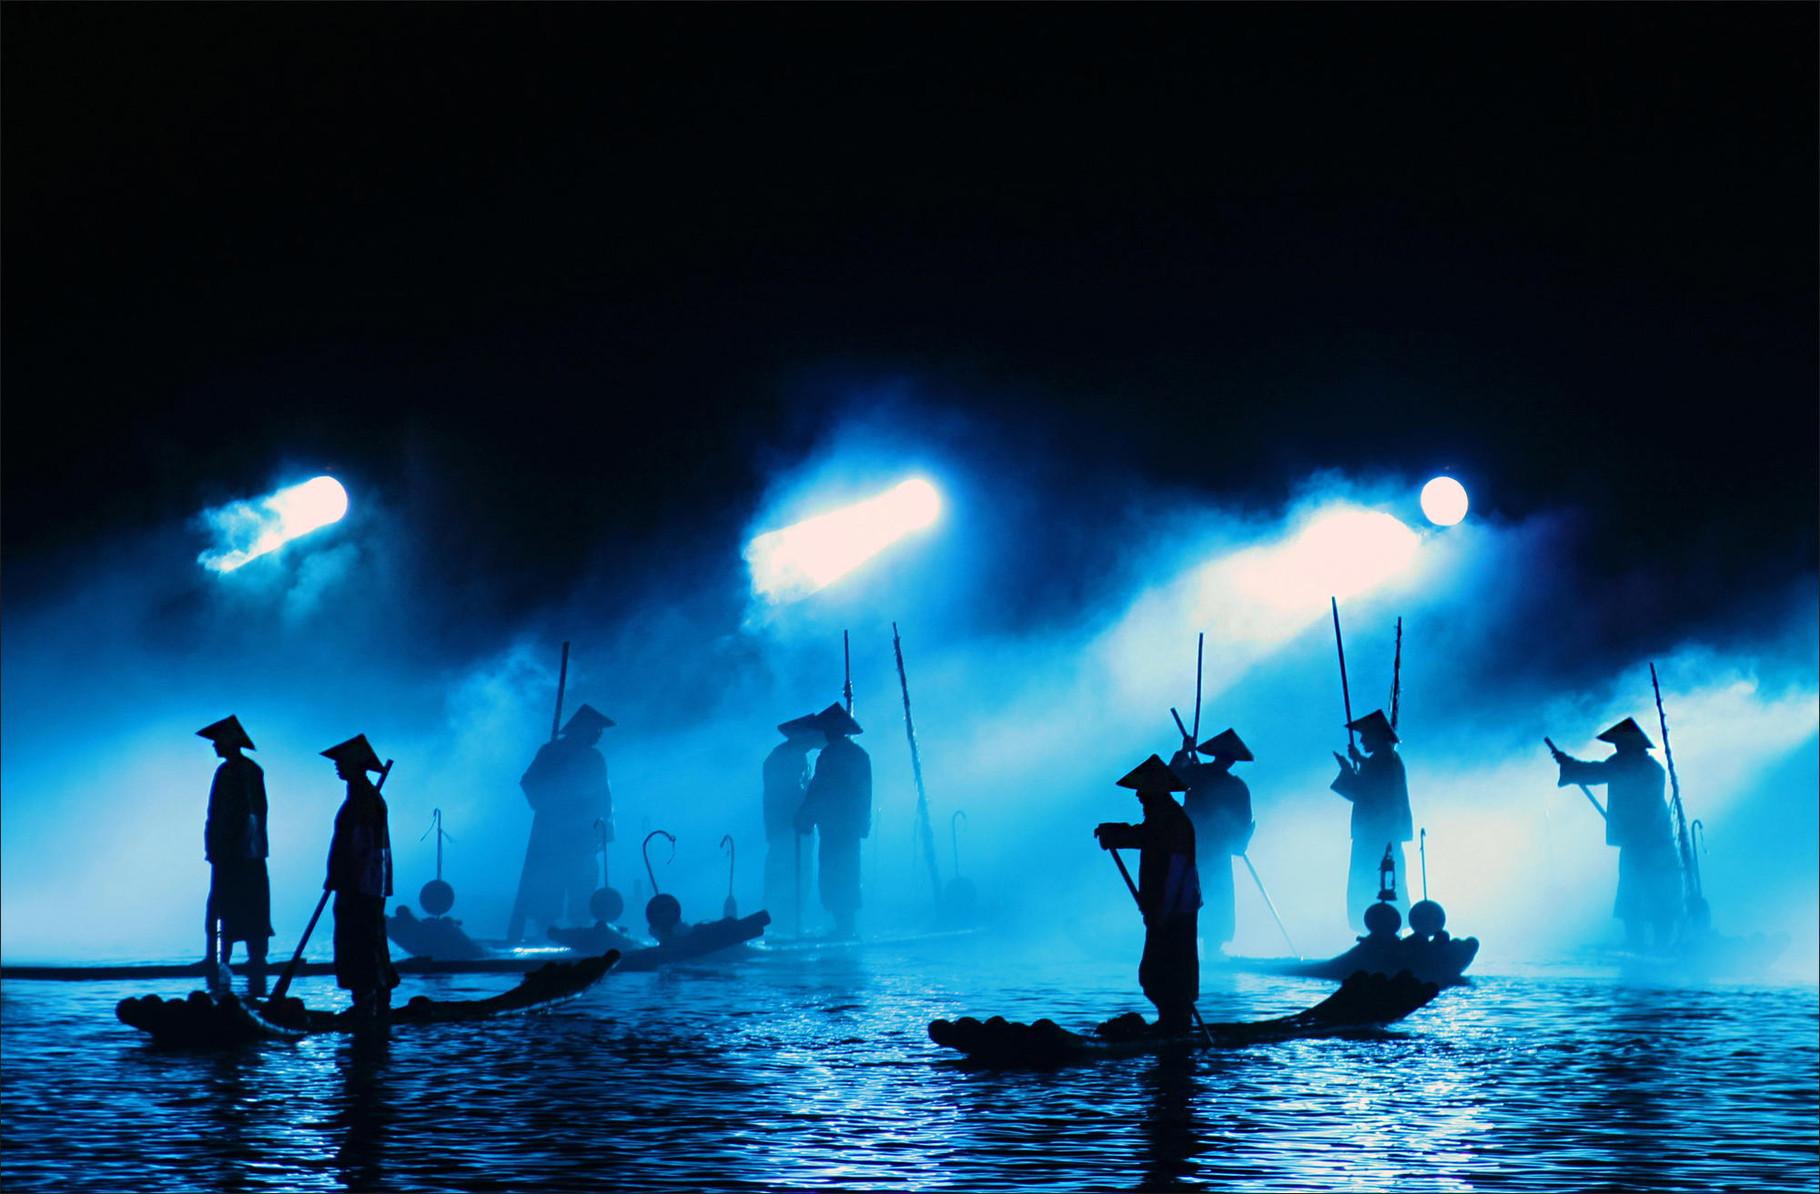 Impressions Sanjie Liu in Yangshuo mit über 600 Akteuren